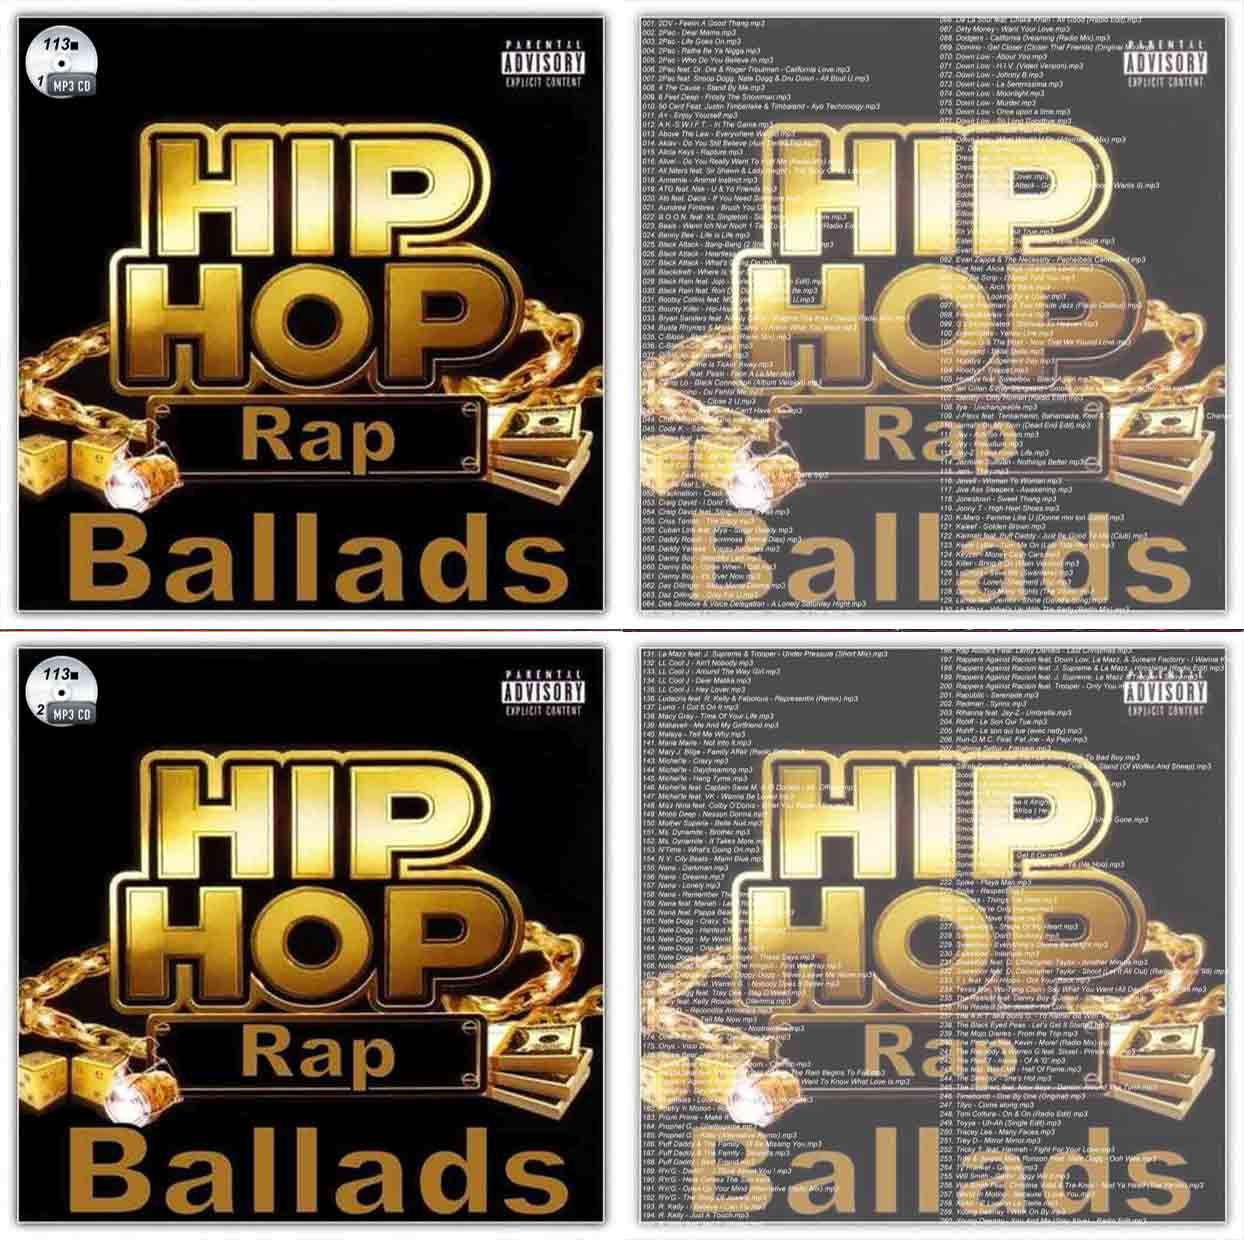 113■2枚 Hip Hop & Rap Ballads 260曲 Daddy Yankee Eminem Jay-Z Rihanna CD